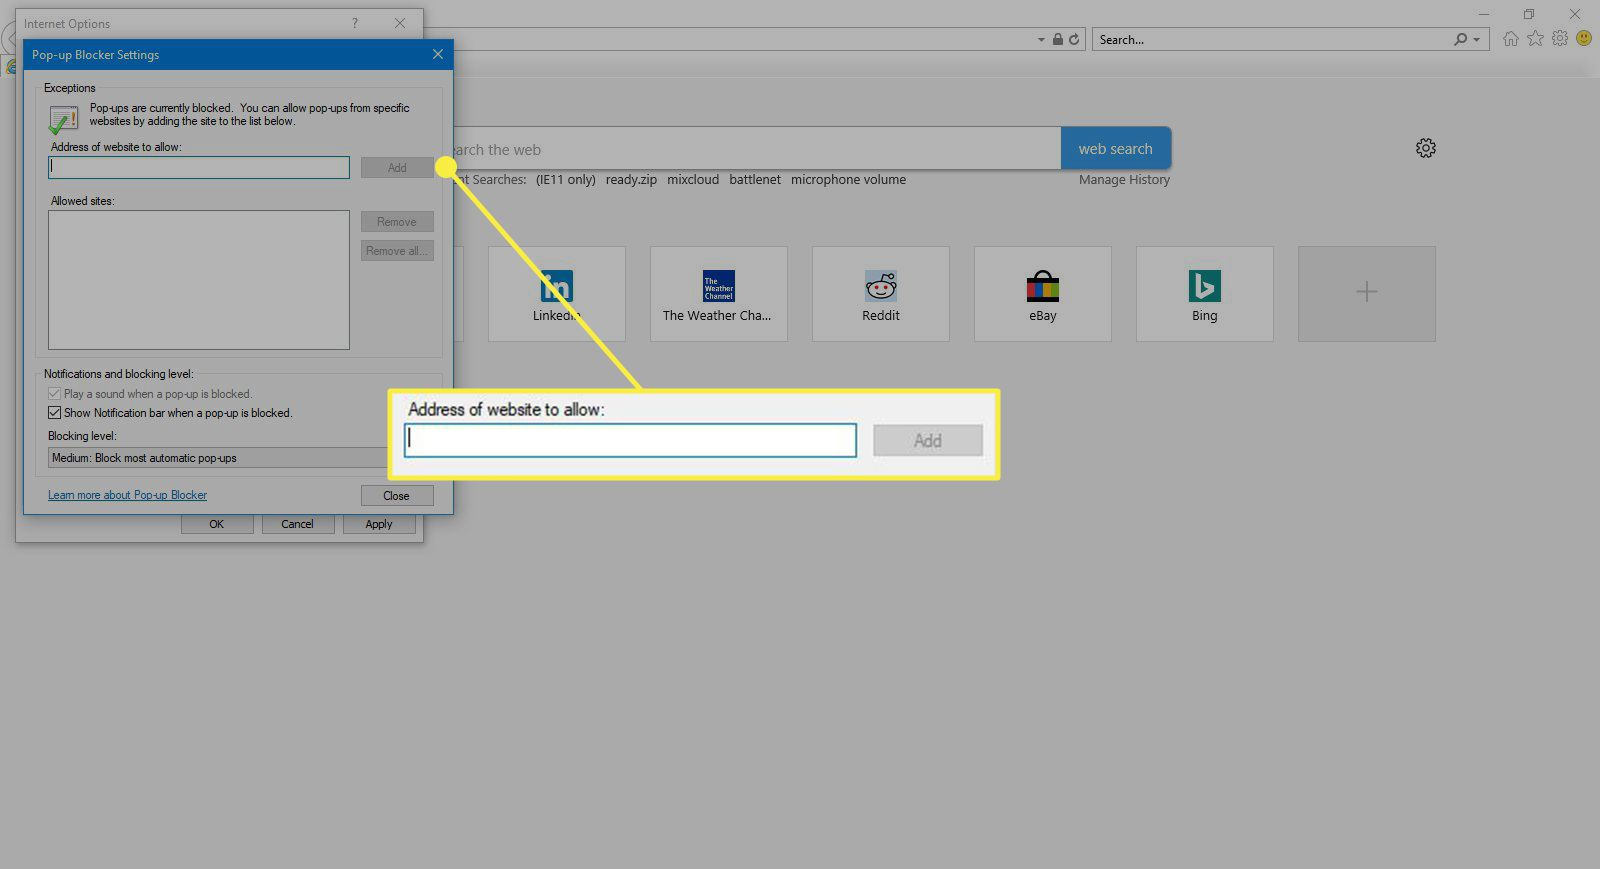 The safelist address field and Add button